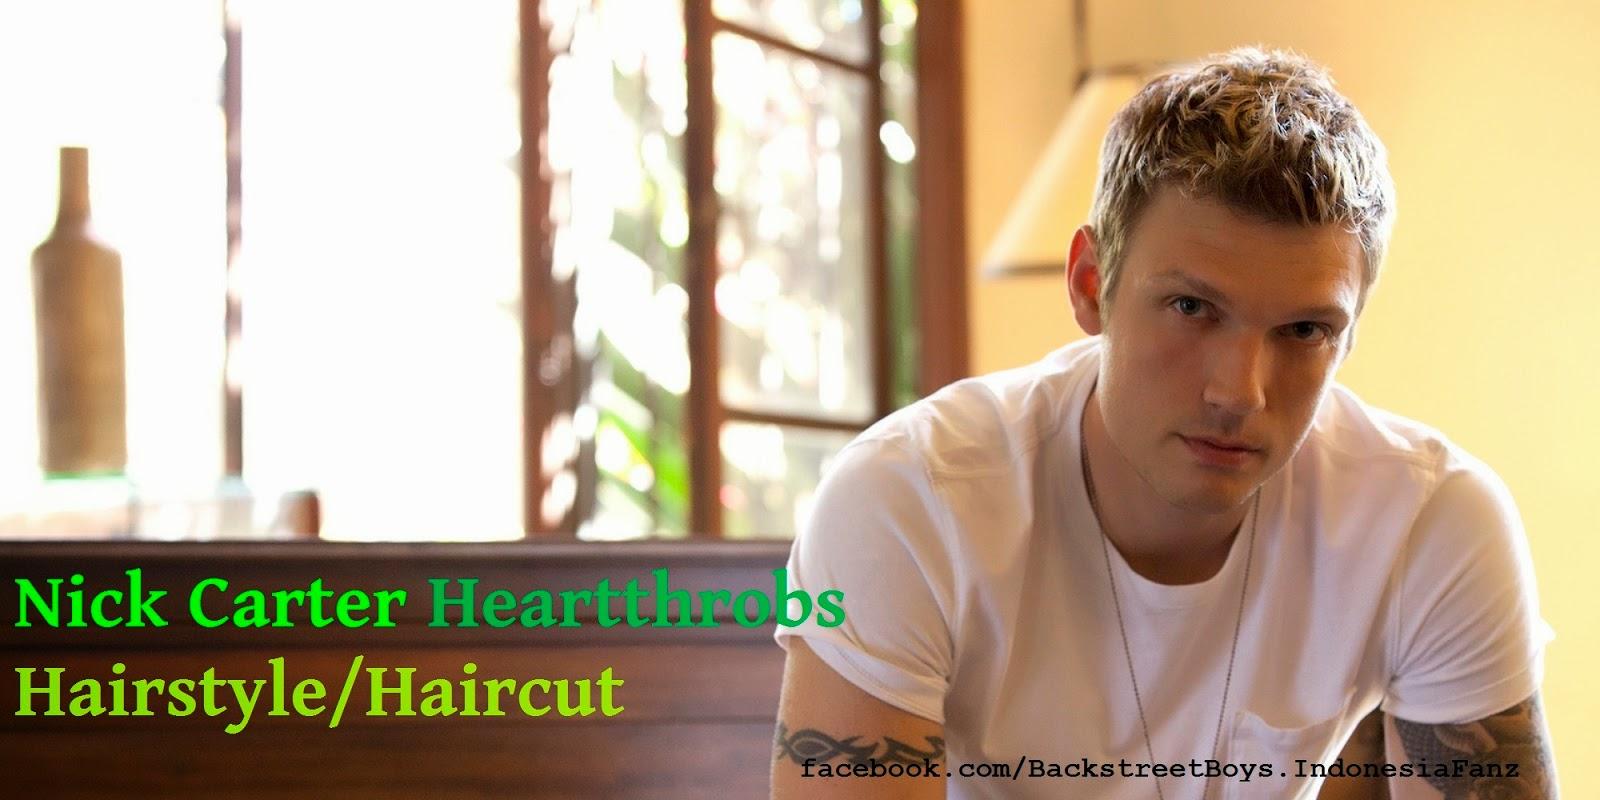 backstreet boys indonesia fanz: nick carter hairstyles